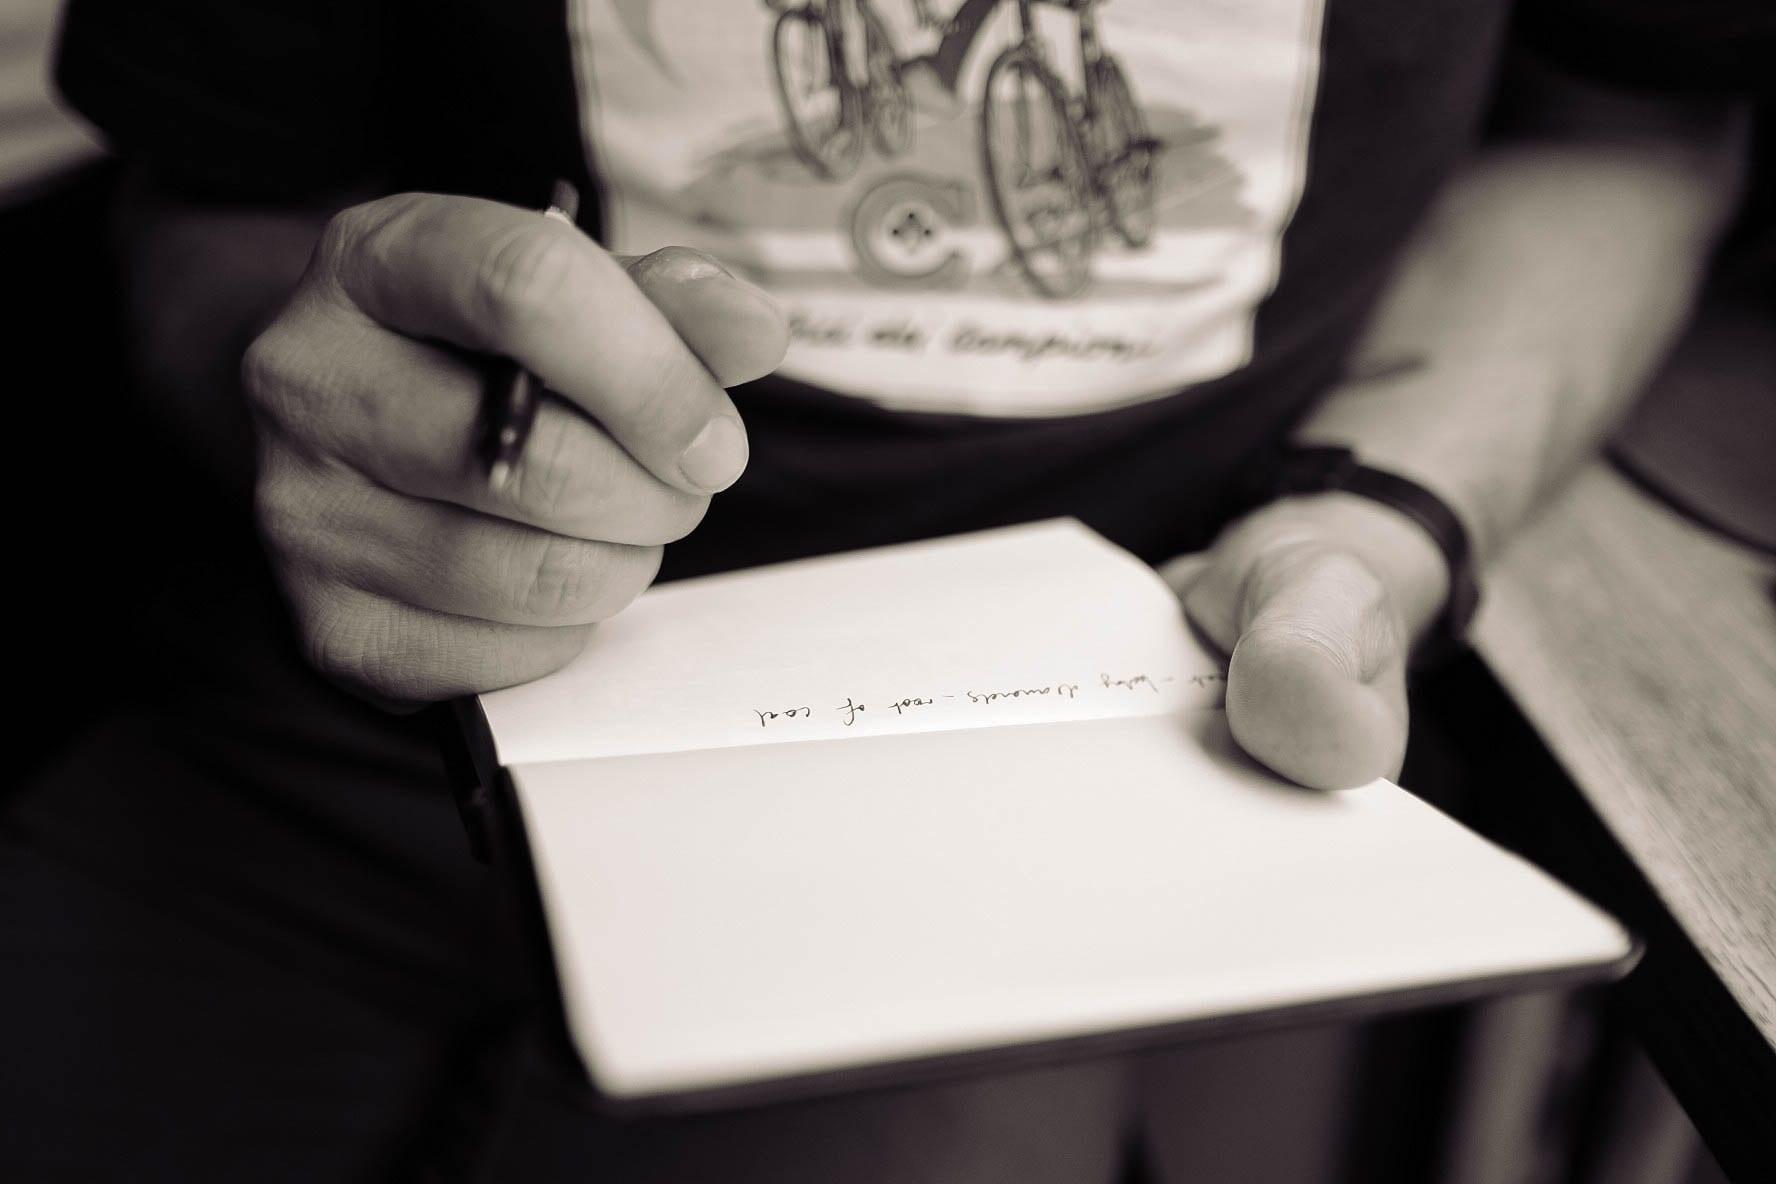 Man writing; image by Calum MacAulay, via Unsplash.com.